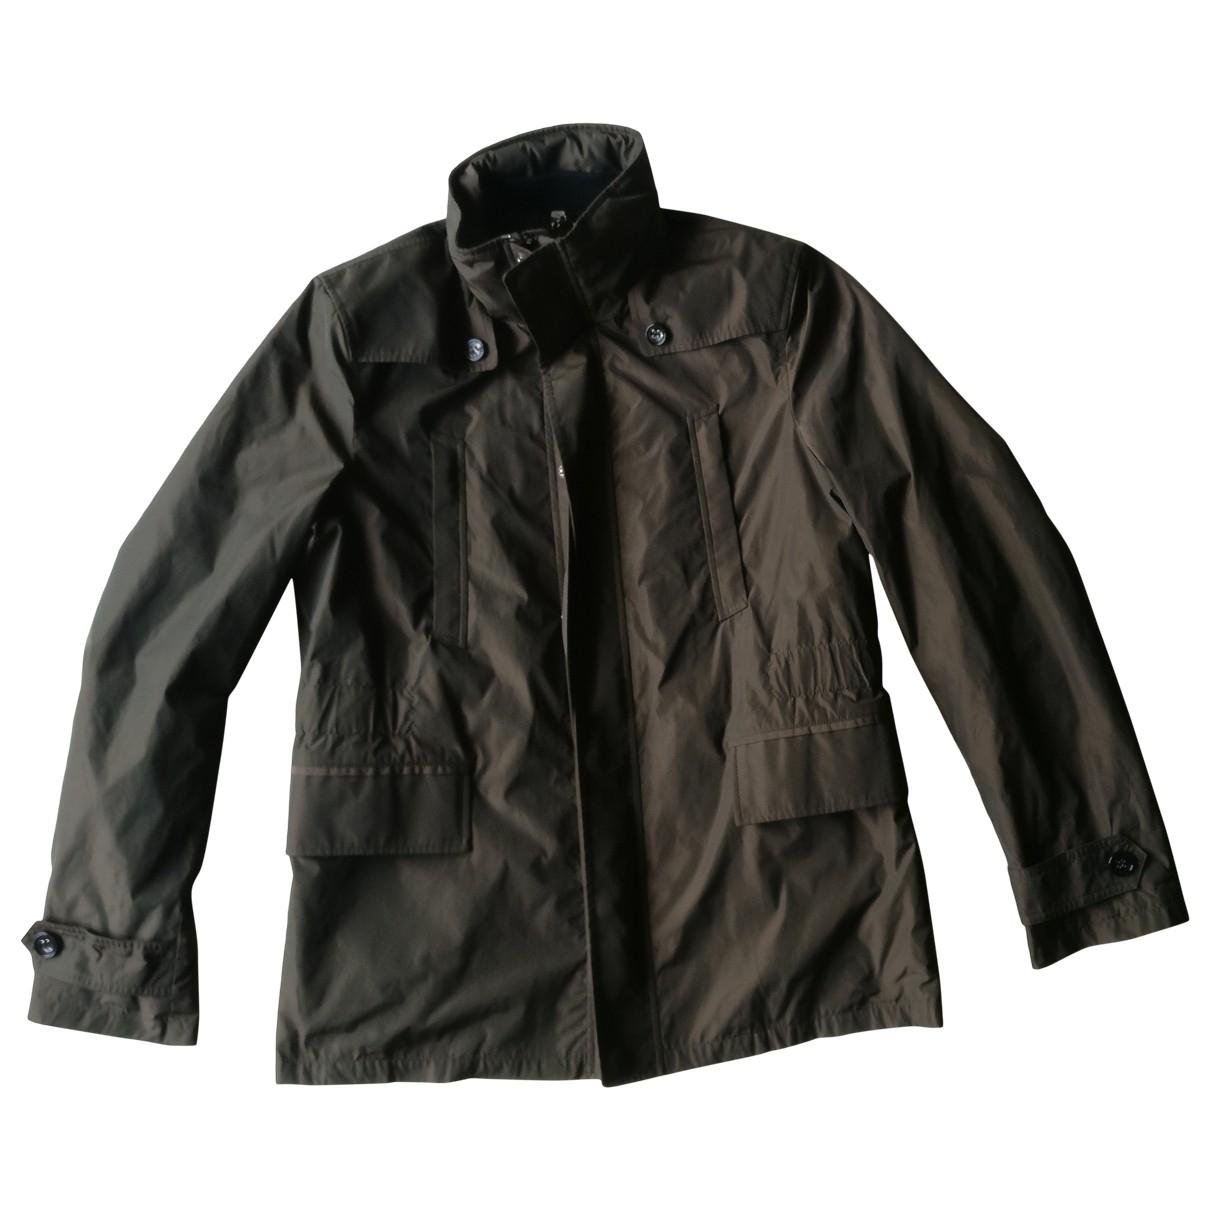 Burberry \N Jacke in  Khaki Polyester